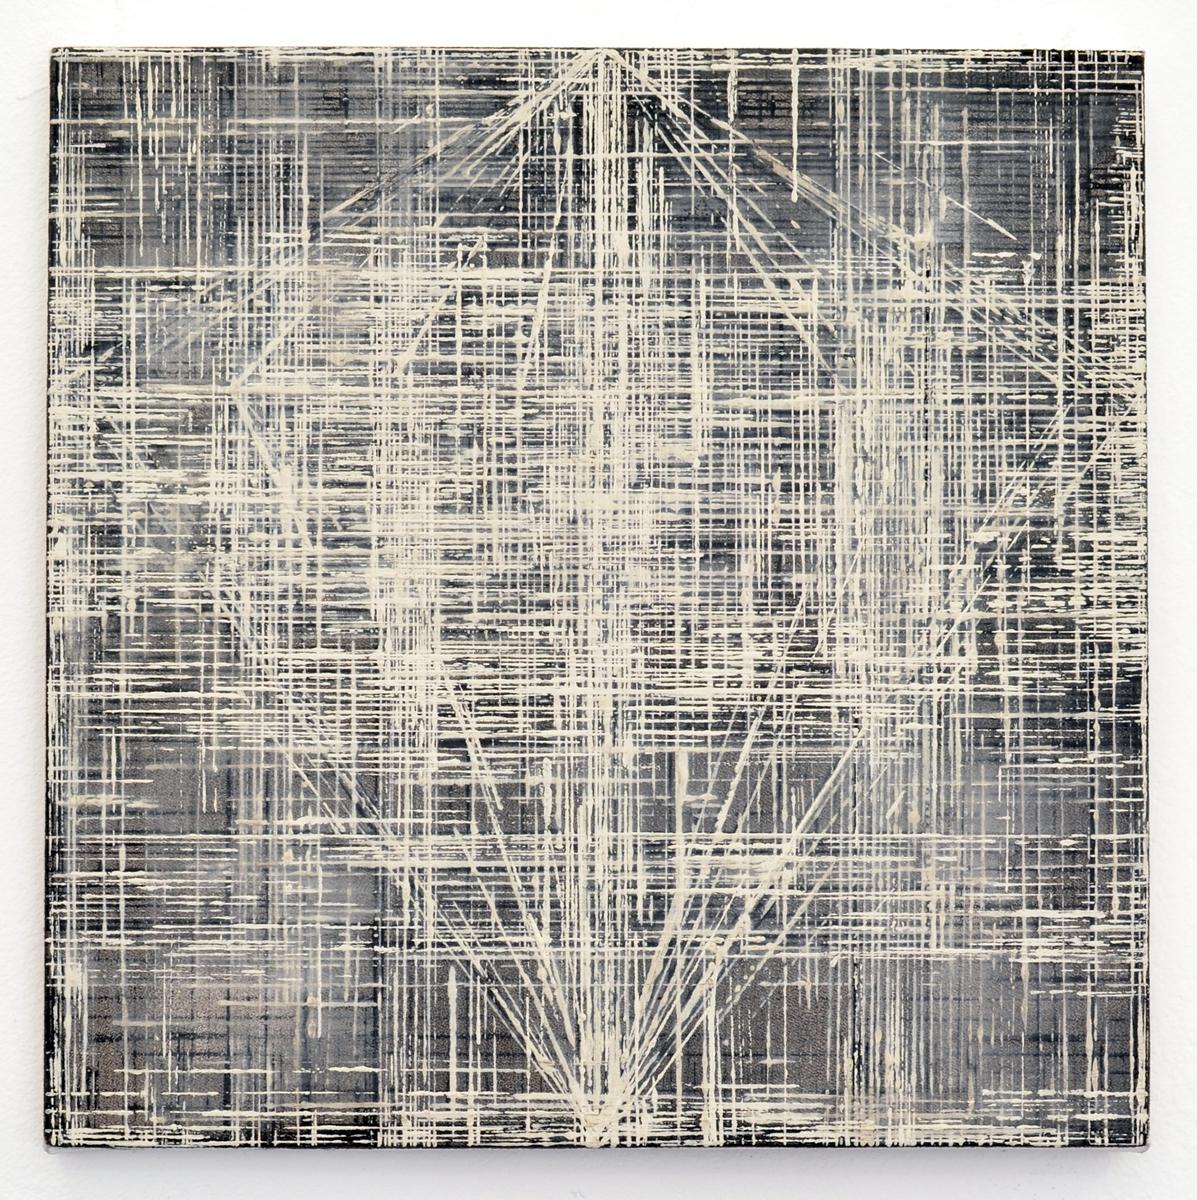 Rieko Hotta, Obelisk Series 1, 2017. Tempera on cotton canvas, 30 x 30 cm